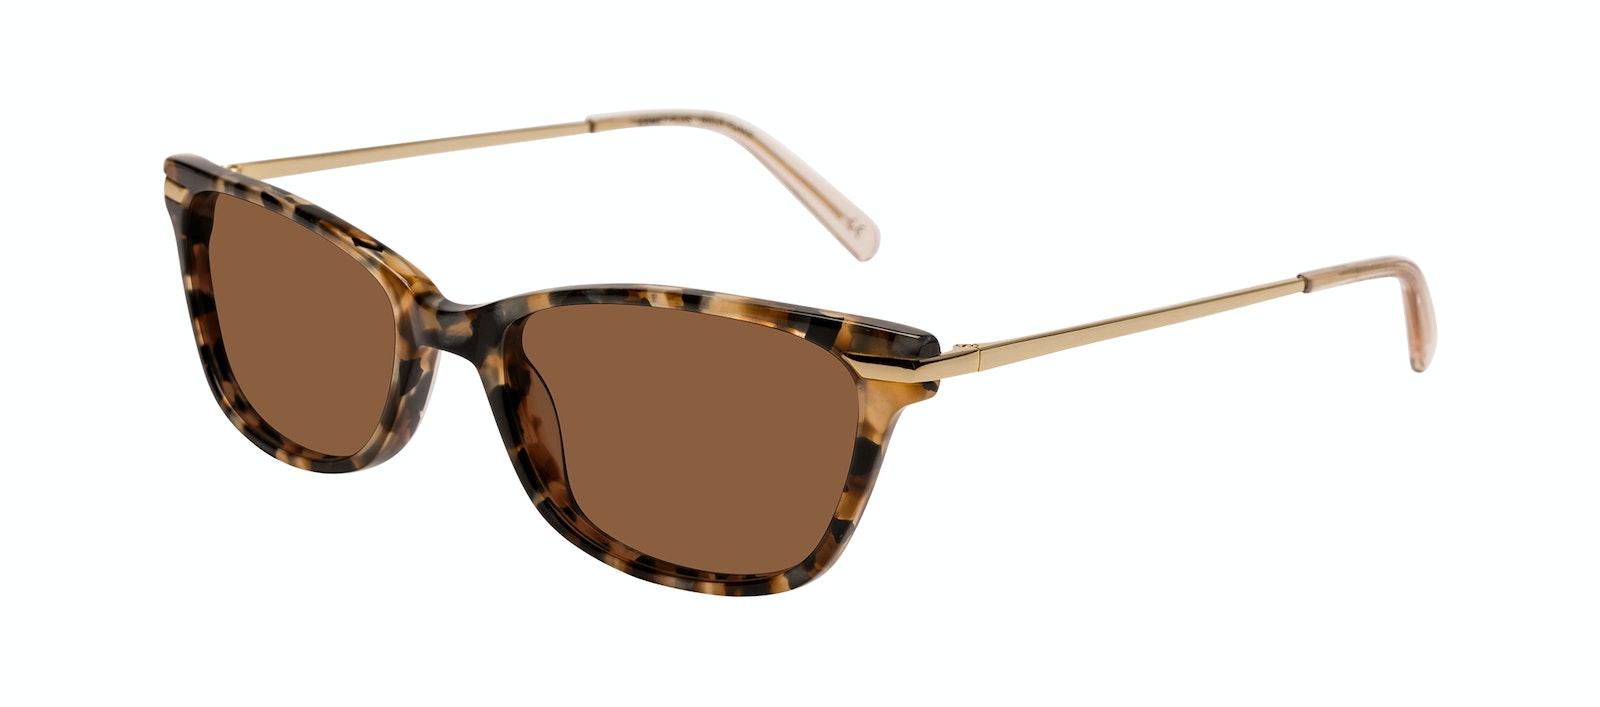 Affordable Fashion Glasses Rectangle Sunglasses Women Comet Plus Gold Flake Tilt